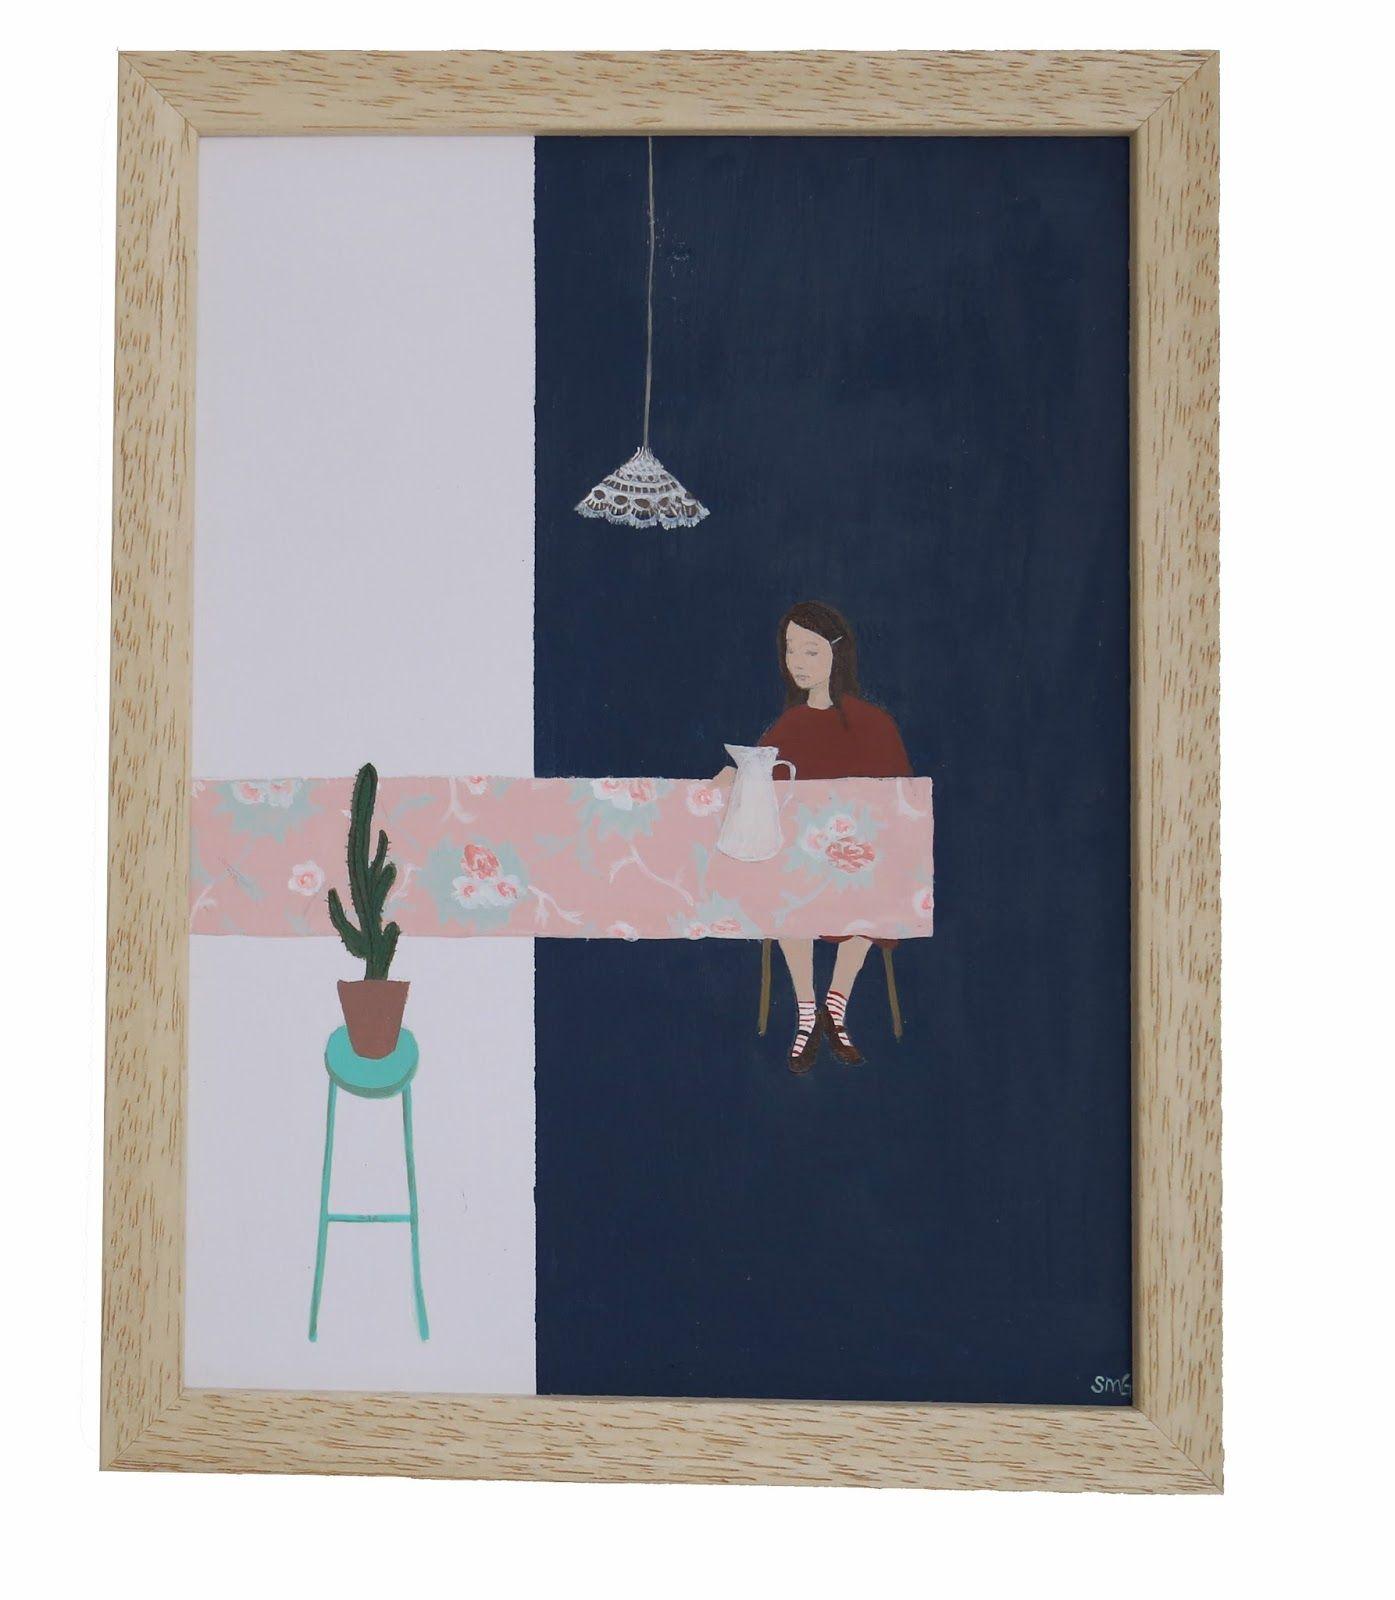 saar manche painting peinture pinterest peinture illustration et painting. Black Bedroom Furniture Sets. Home Design Ideas